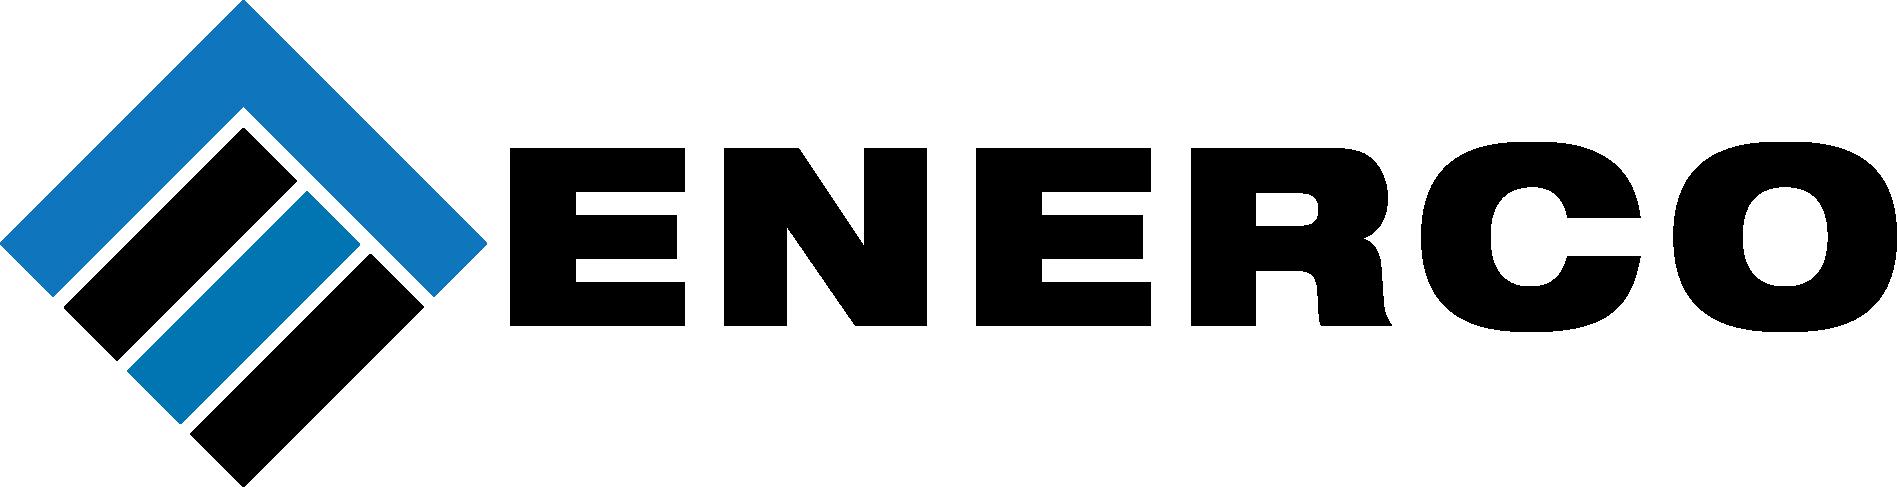 Enerco HFA Catalog